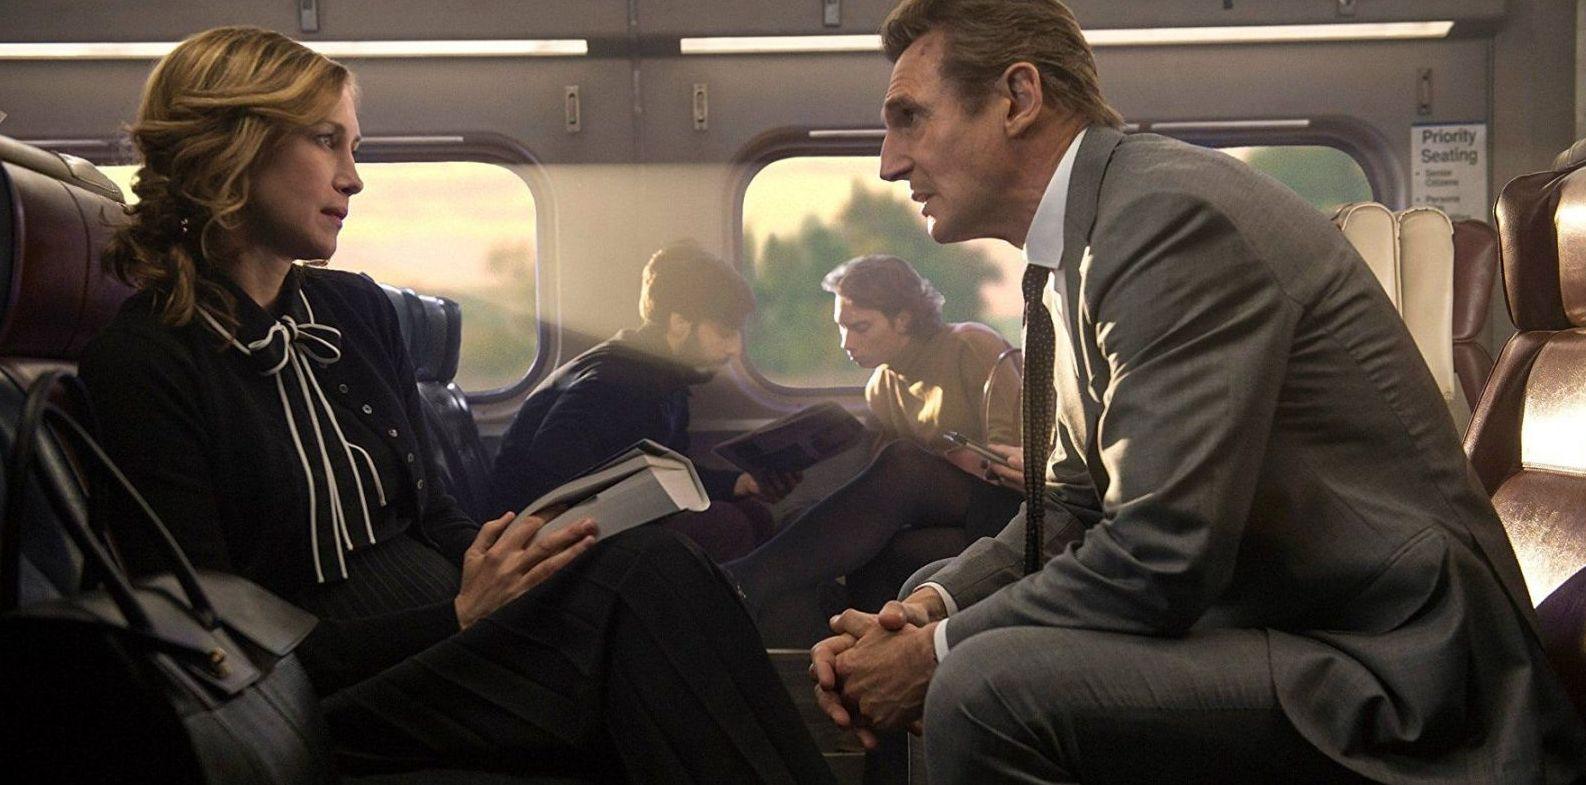 Vera Farmiga and Liam Neeson